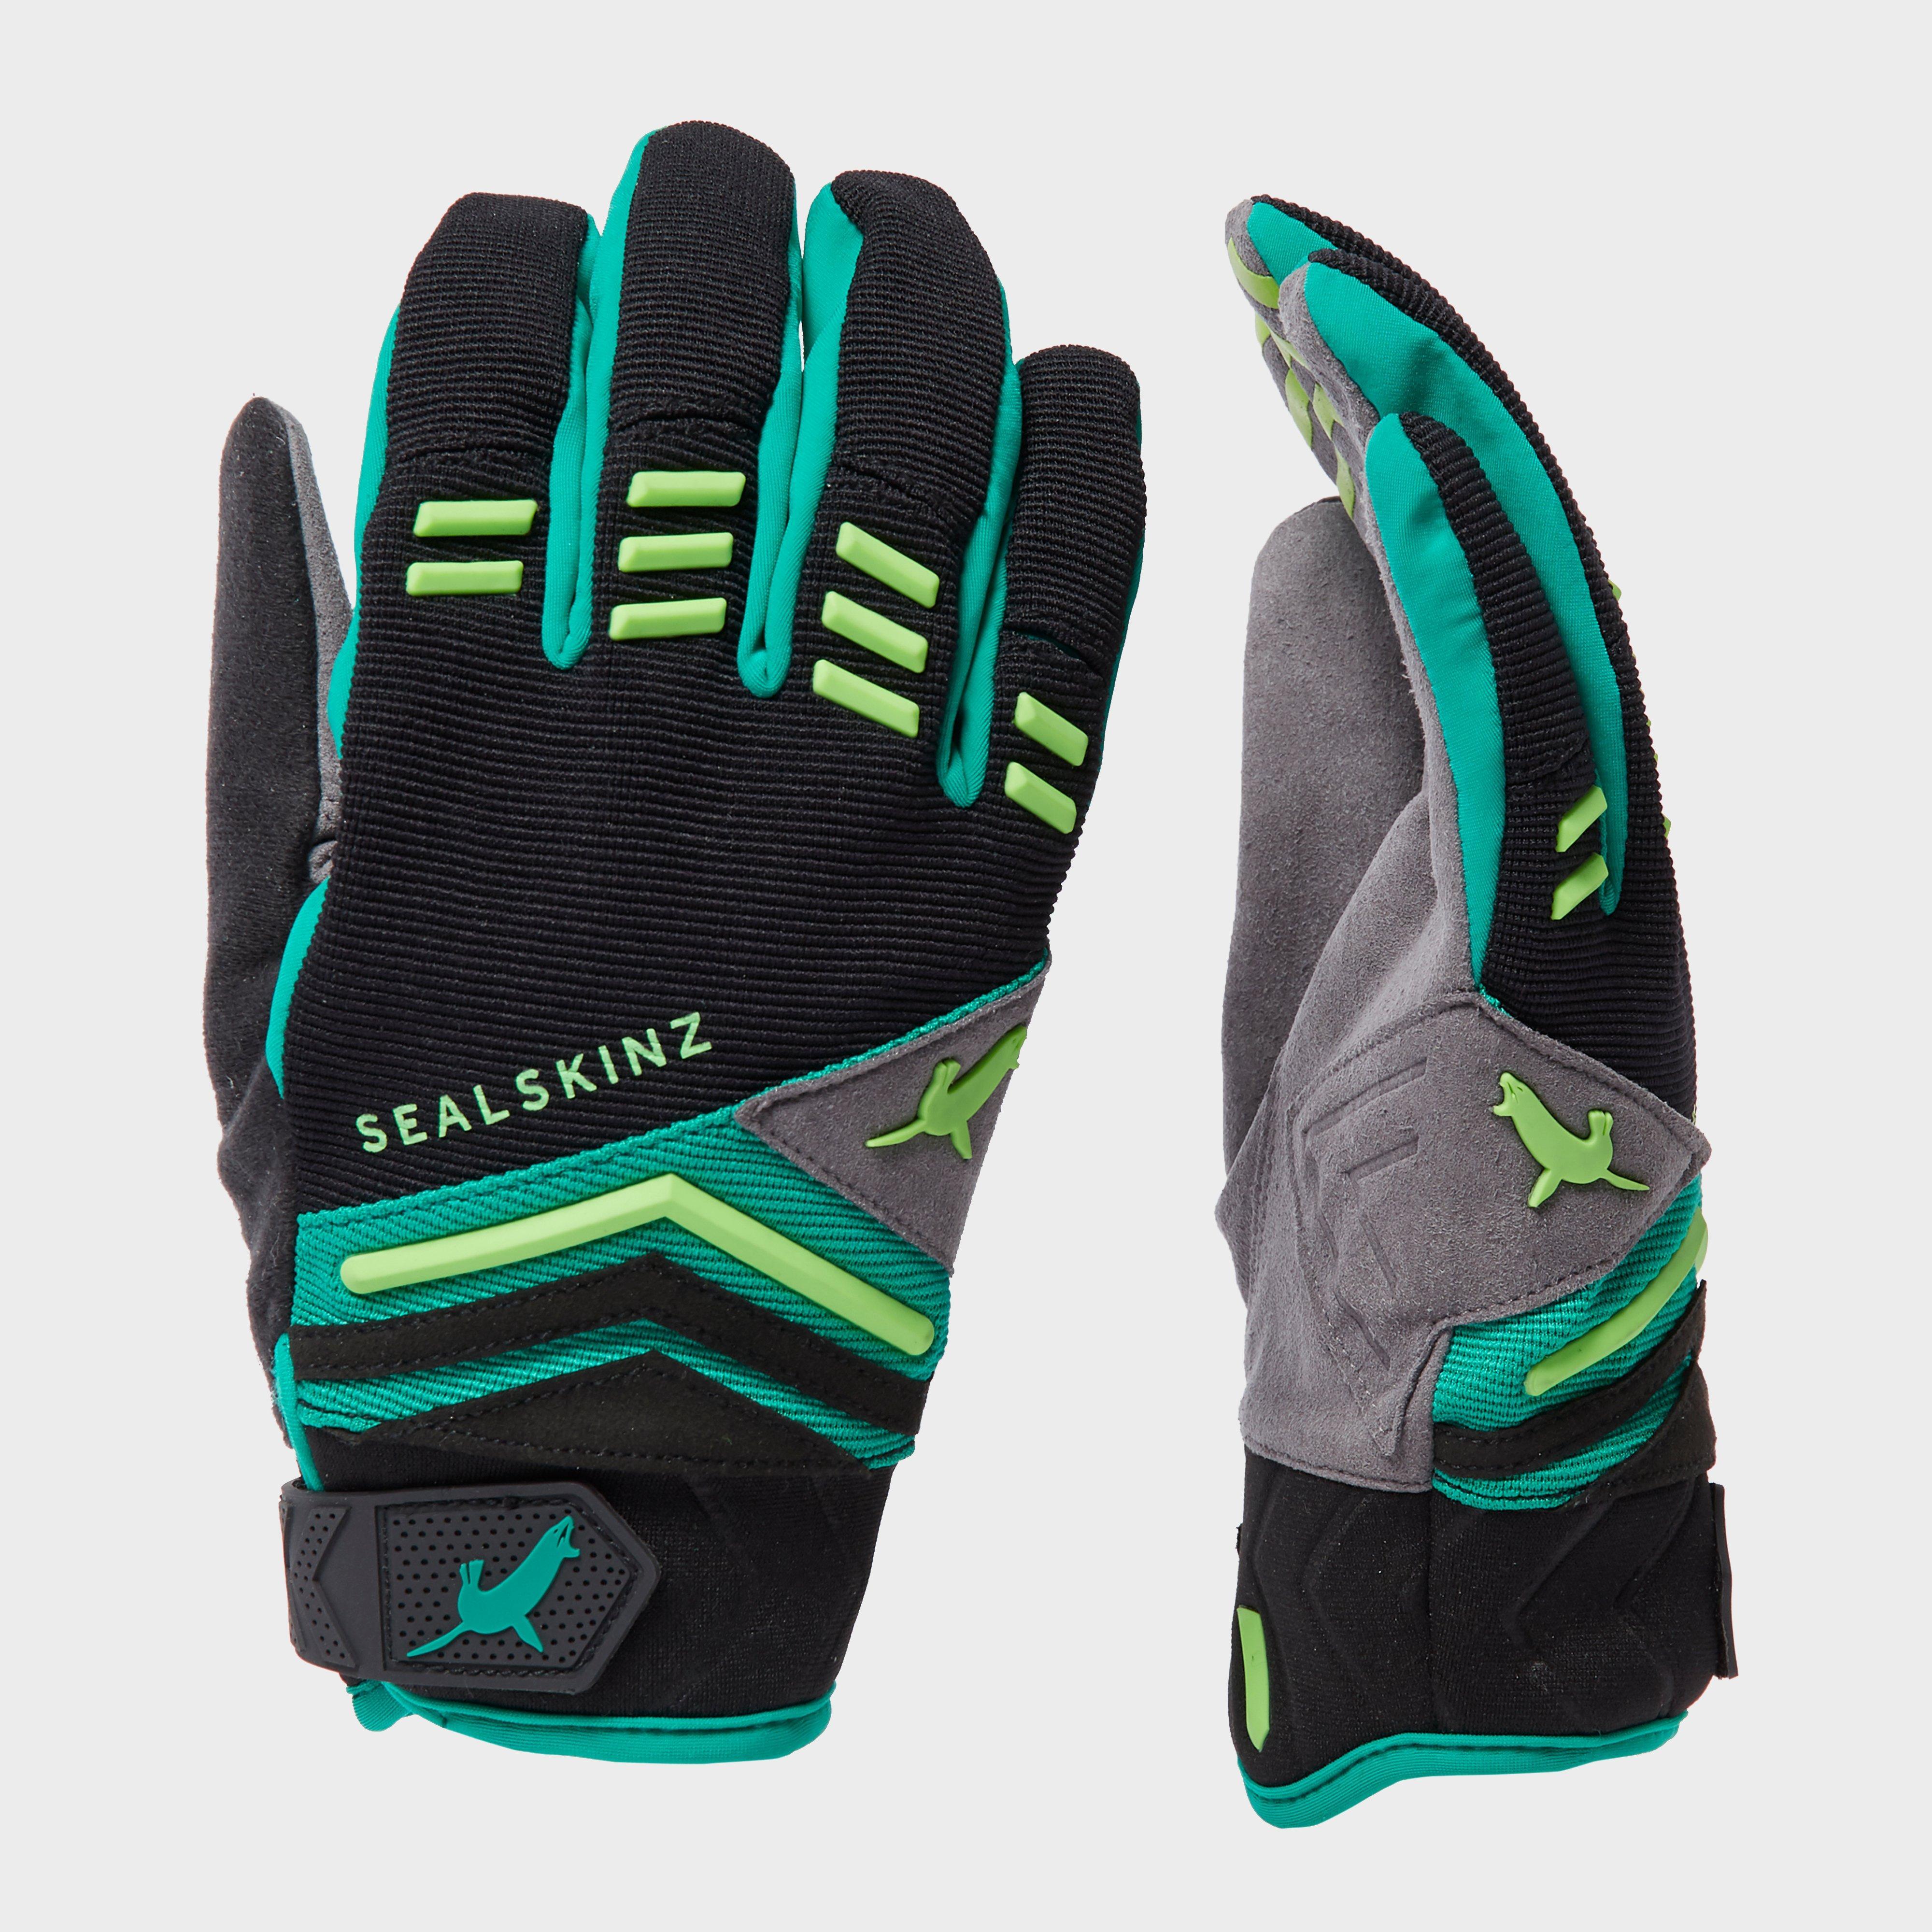 SealSkinz Sealskinz Unisex Dragon Eye MTB Gloves - Green, Green